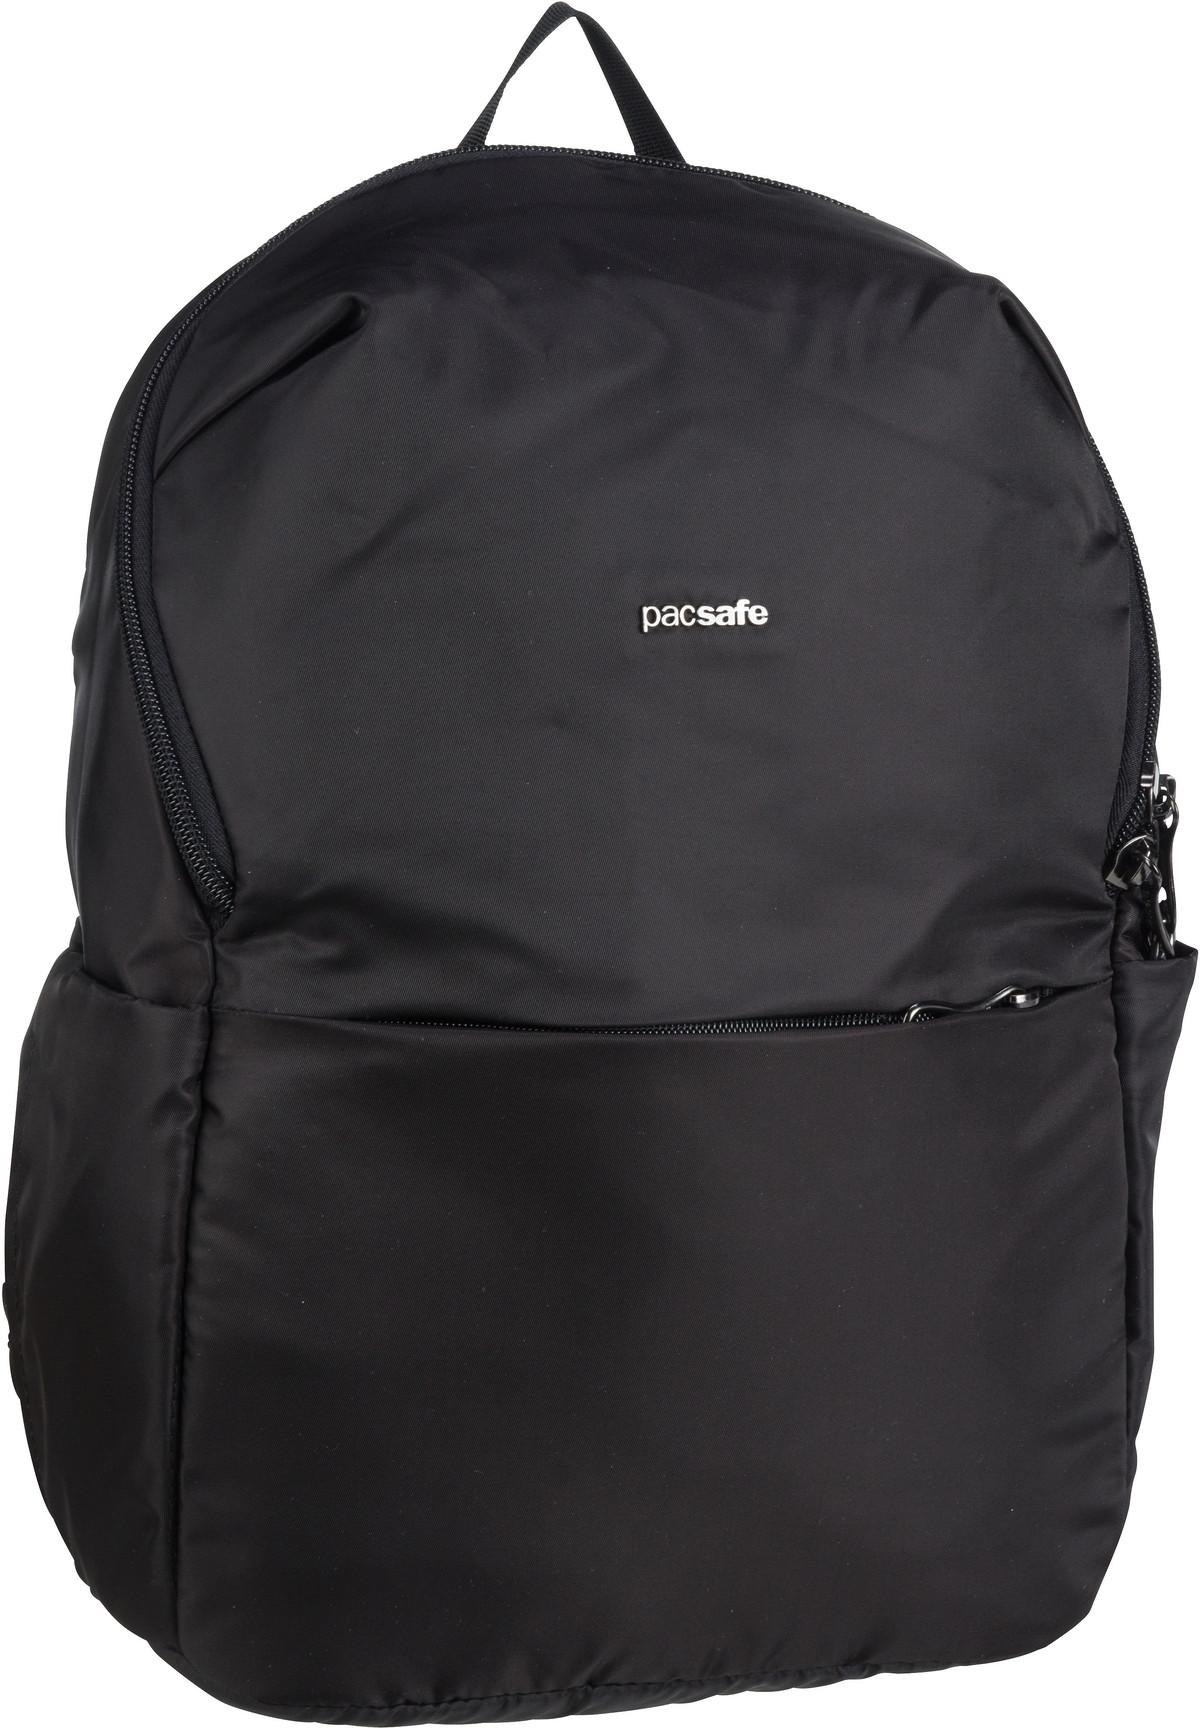 Rucksack / Daypack Cruise essentials Backpack Black (12 Liter)